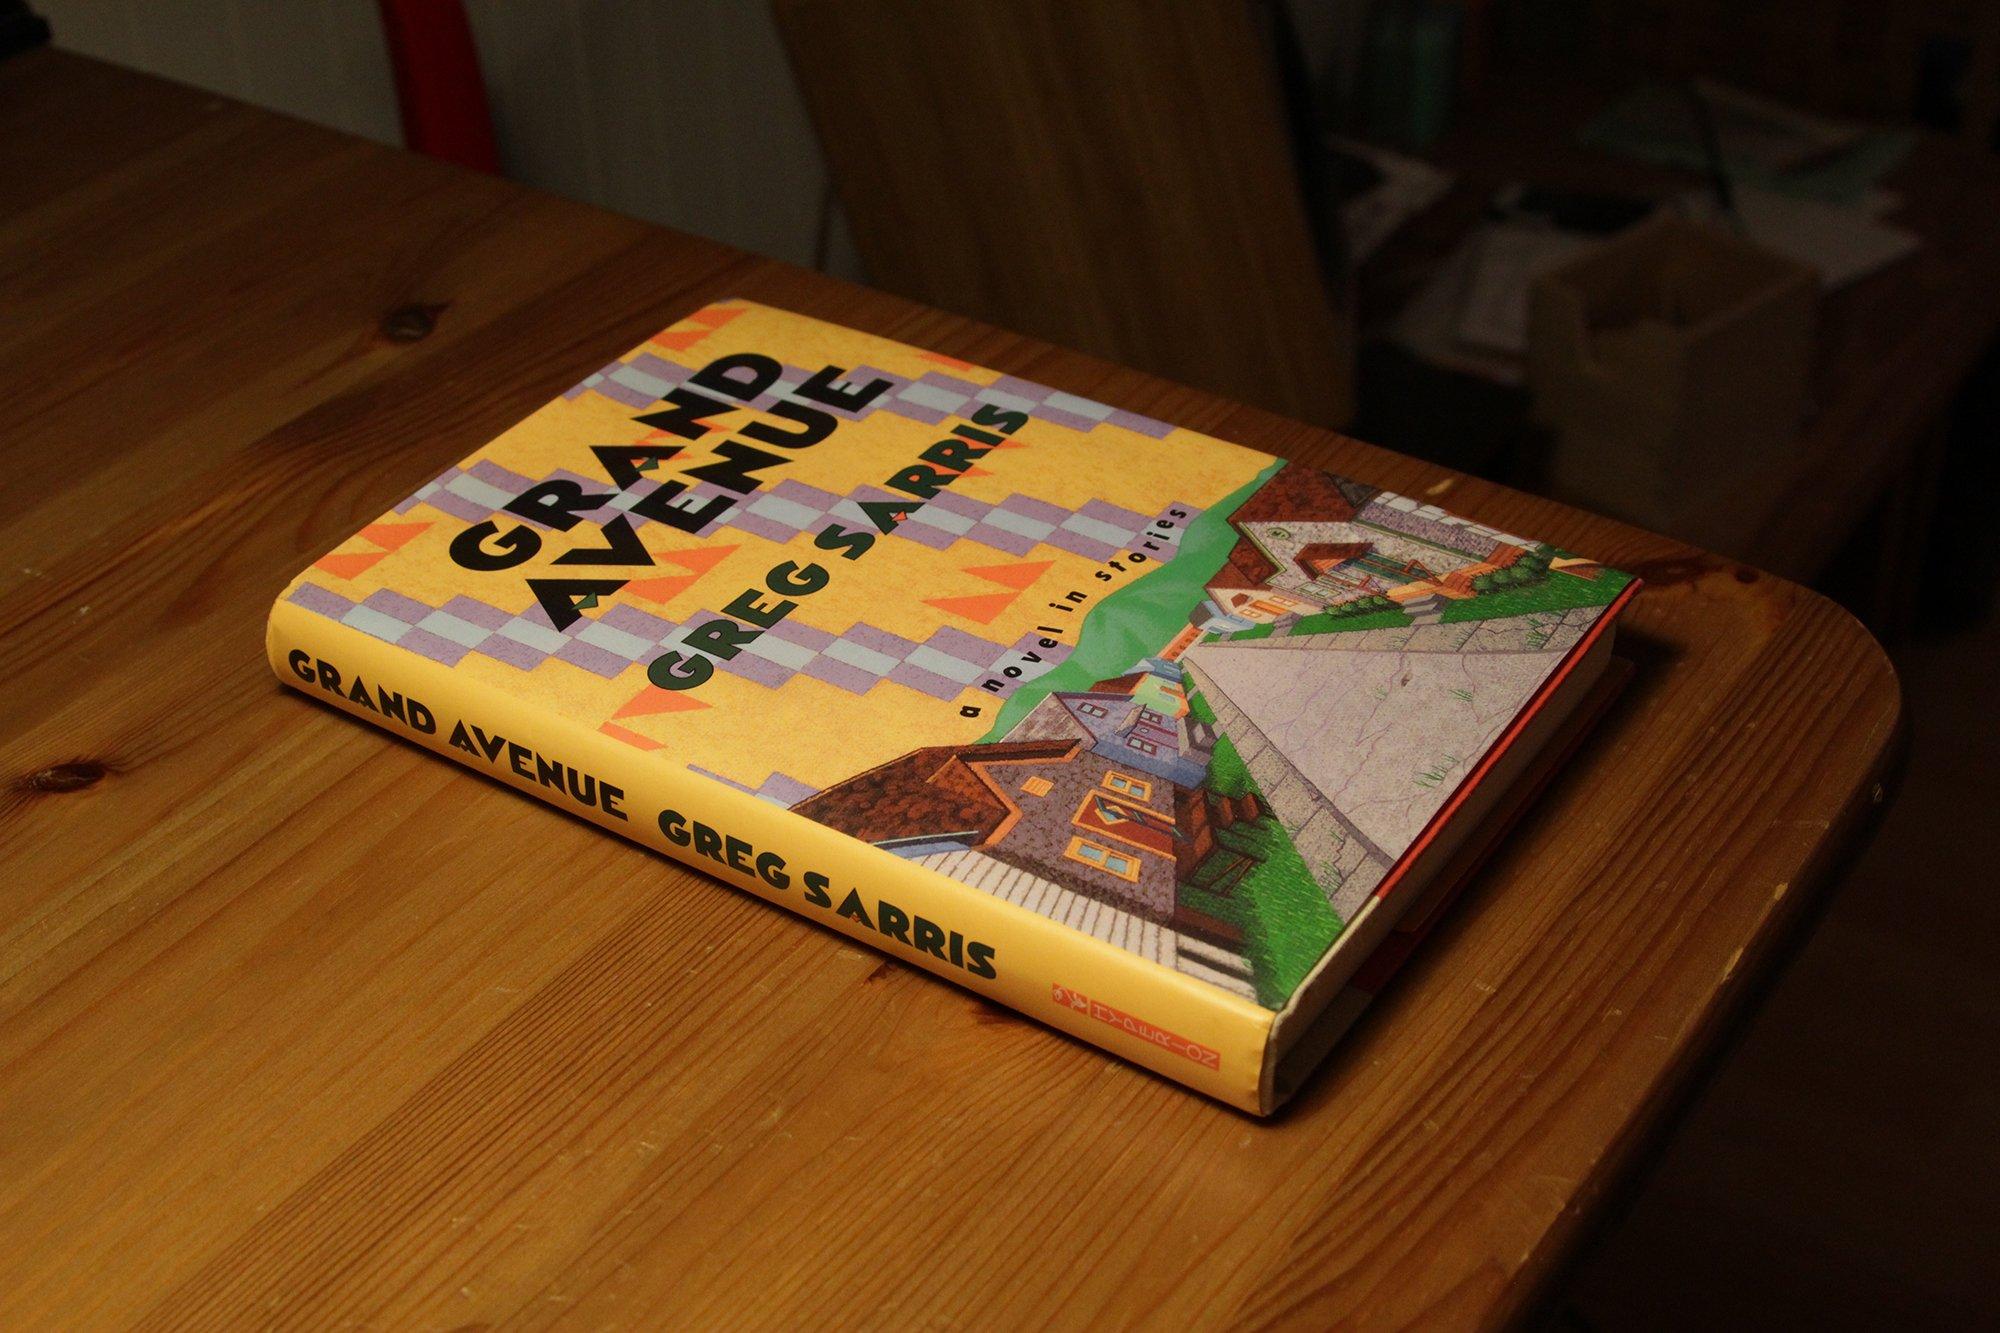 grand avenue greg sarris chapter summary